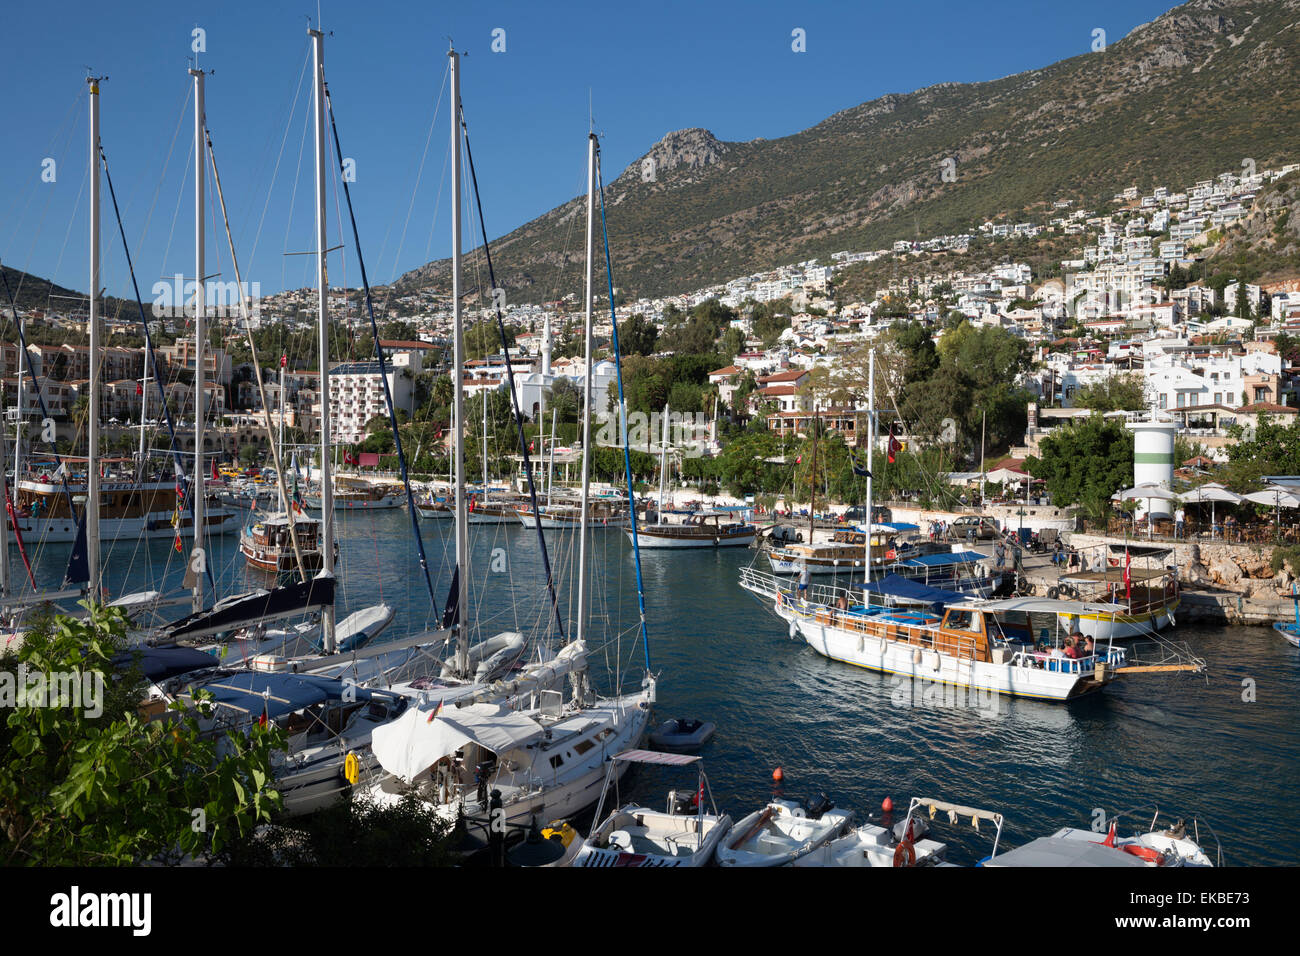 Gulets in harbour, Kalkan, Lycia, Antalya Province, Mediterranean Coast, Southwest Turkey, Turkey, Asia Minor, Eurasia - Stock Image